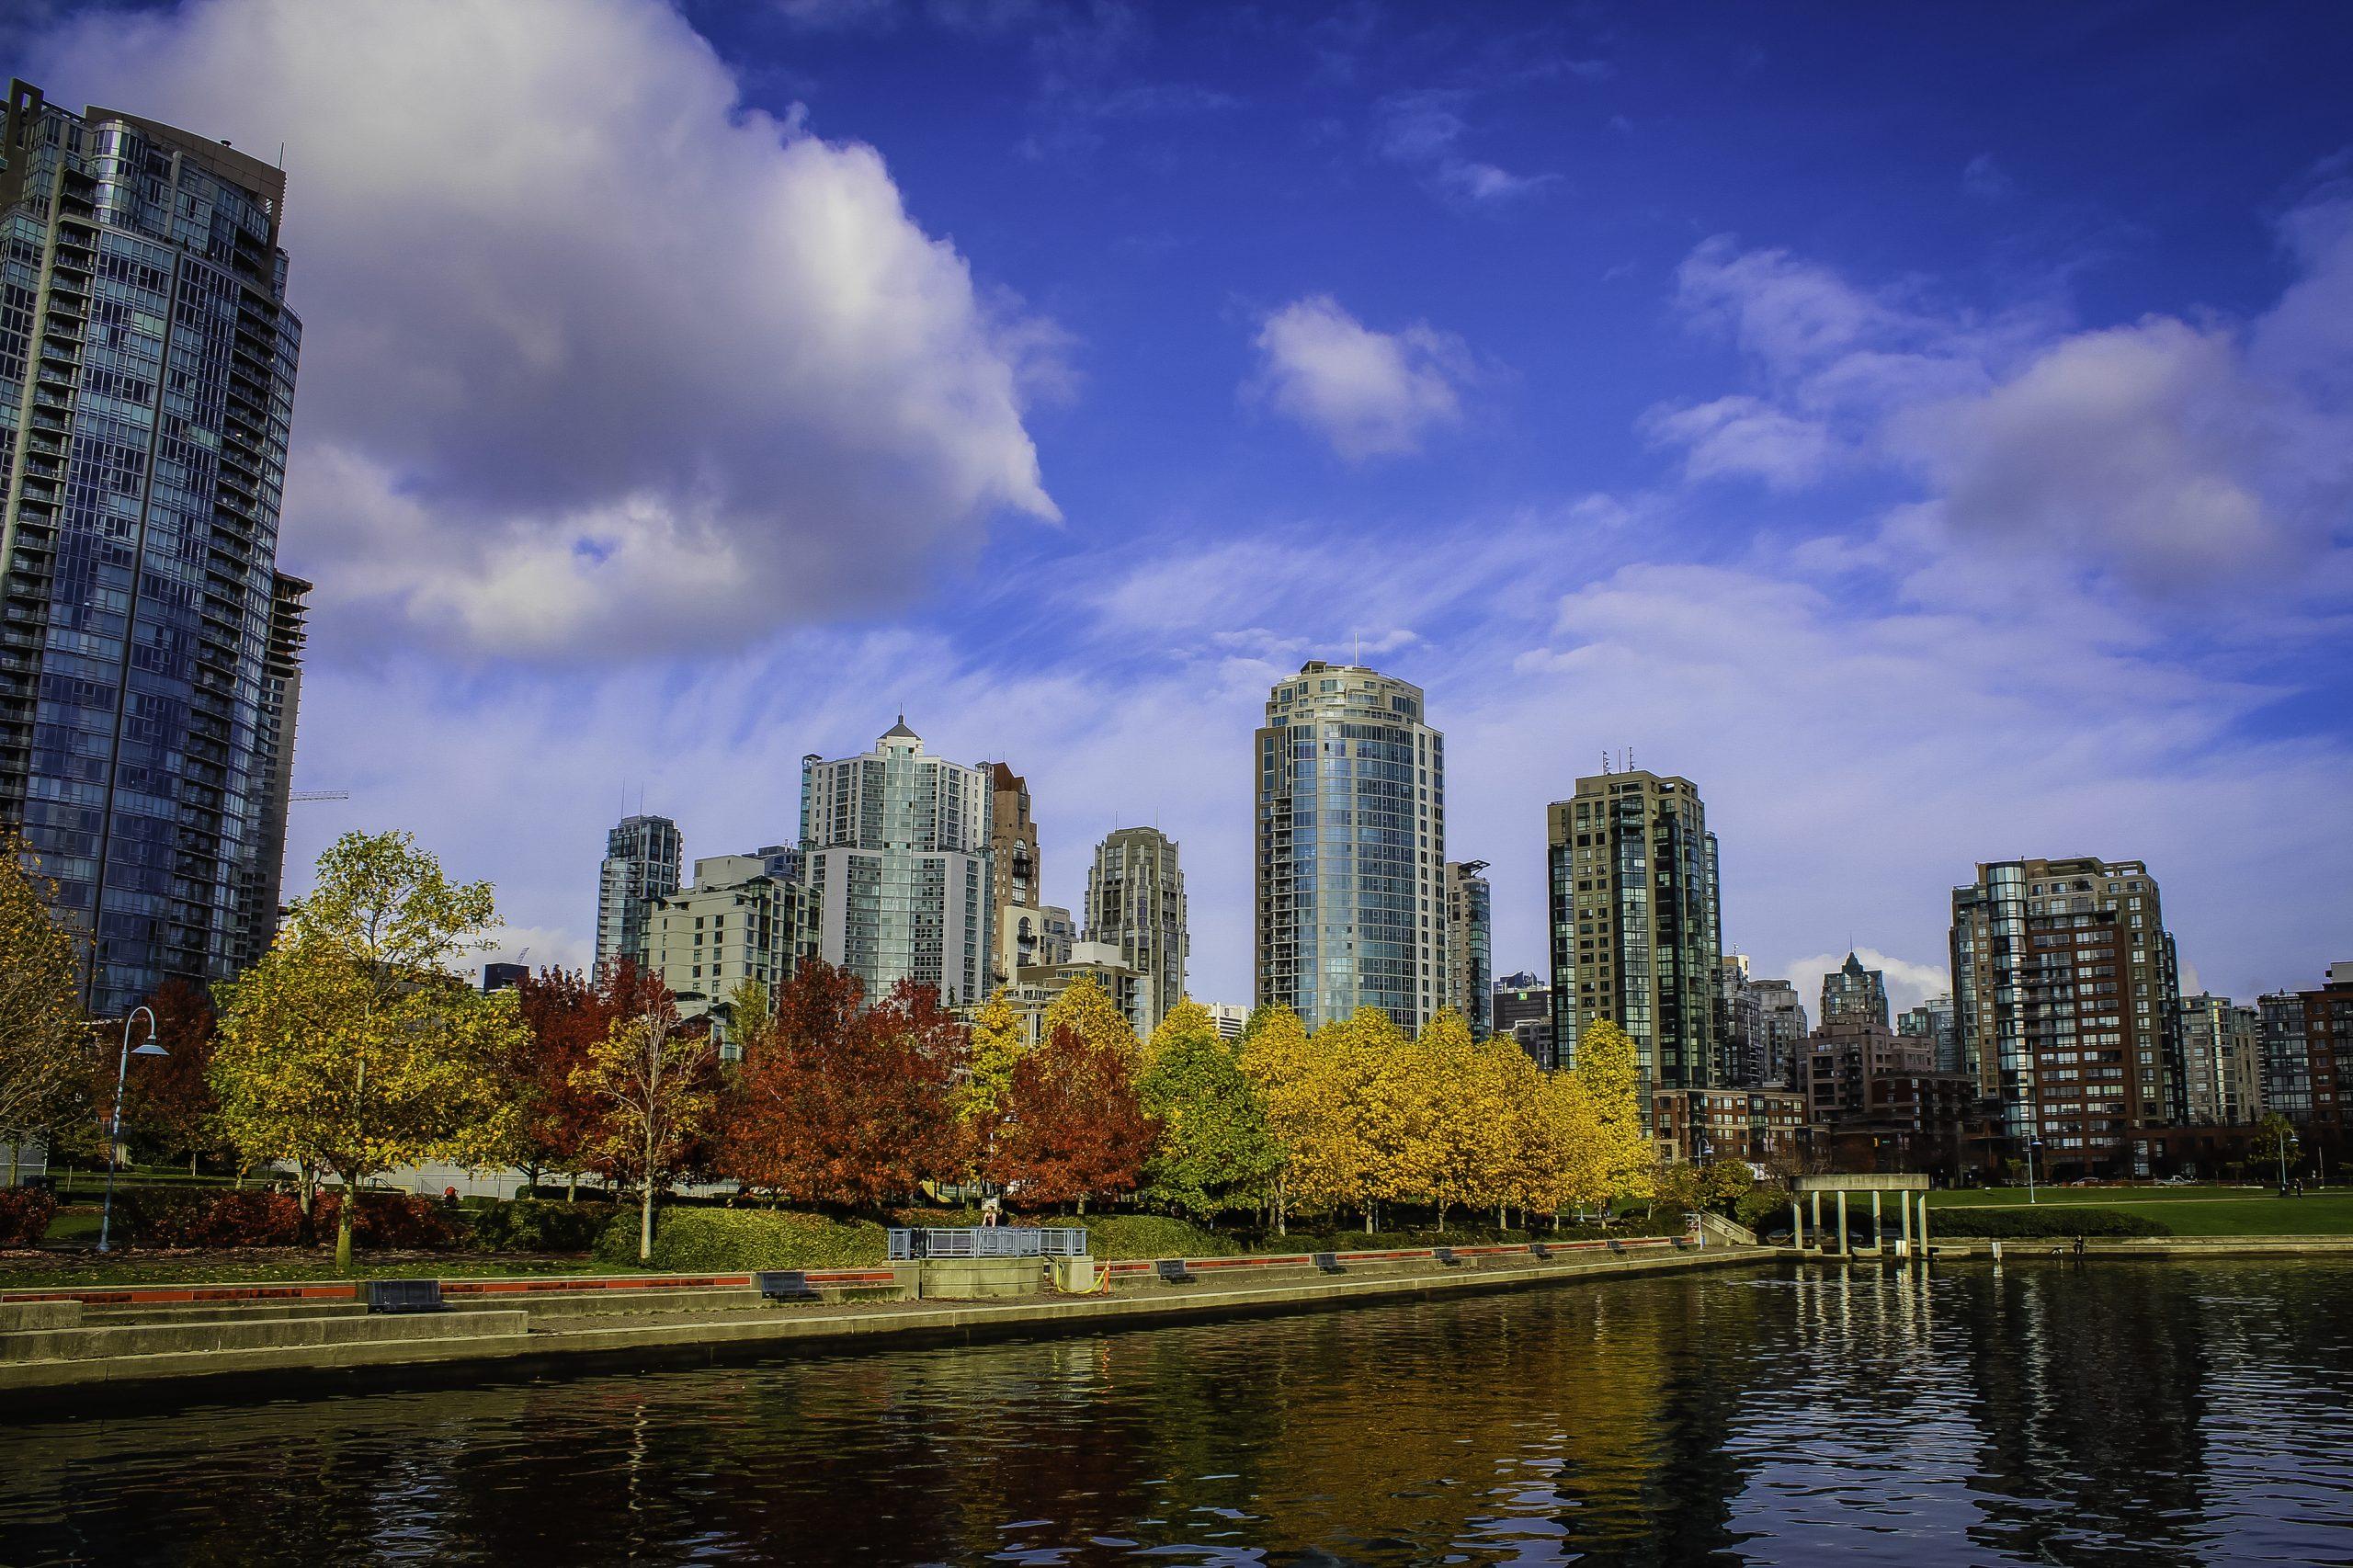 Fall in False Creek, Vancouver was taken along Vancouver, B.C.'s famous seawall walk.